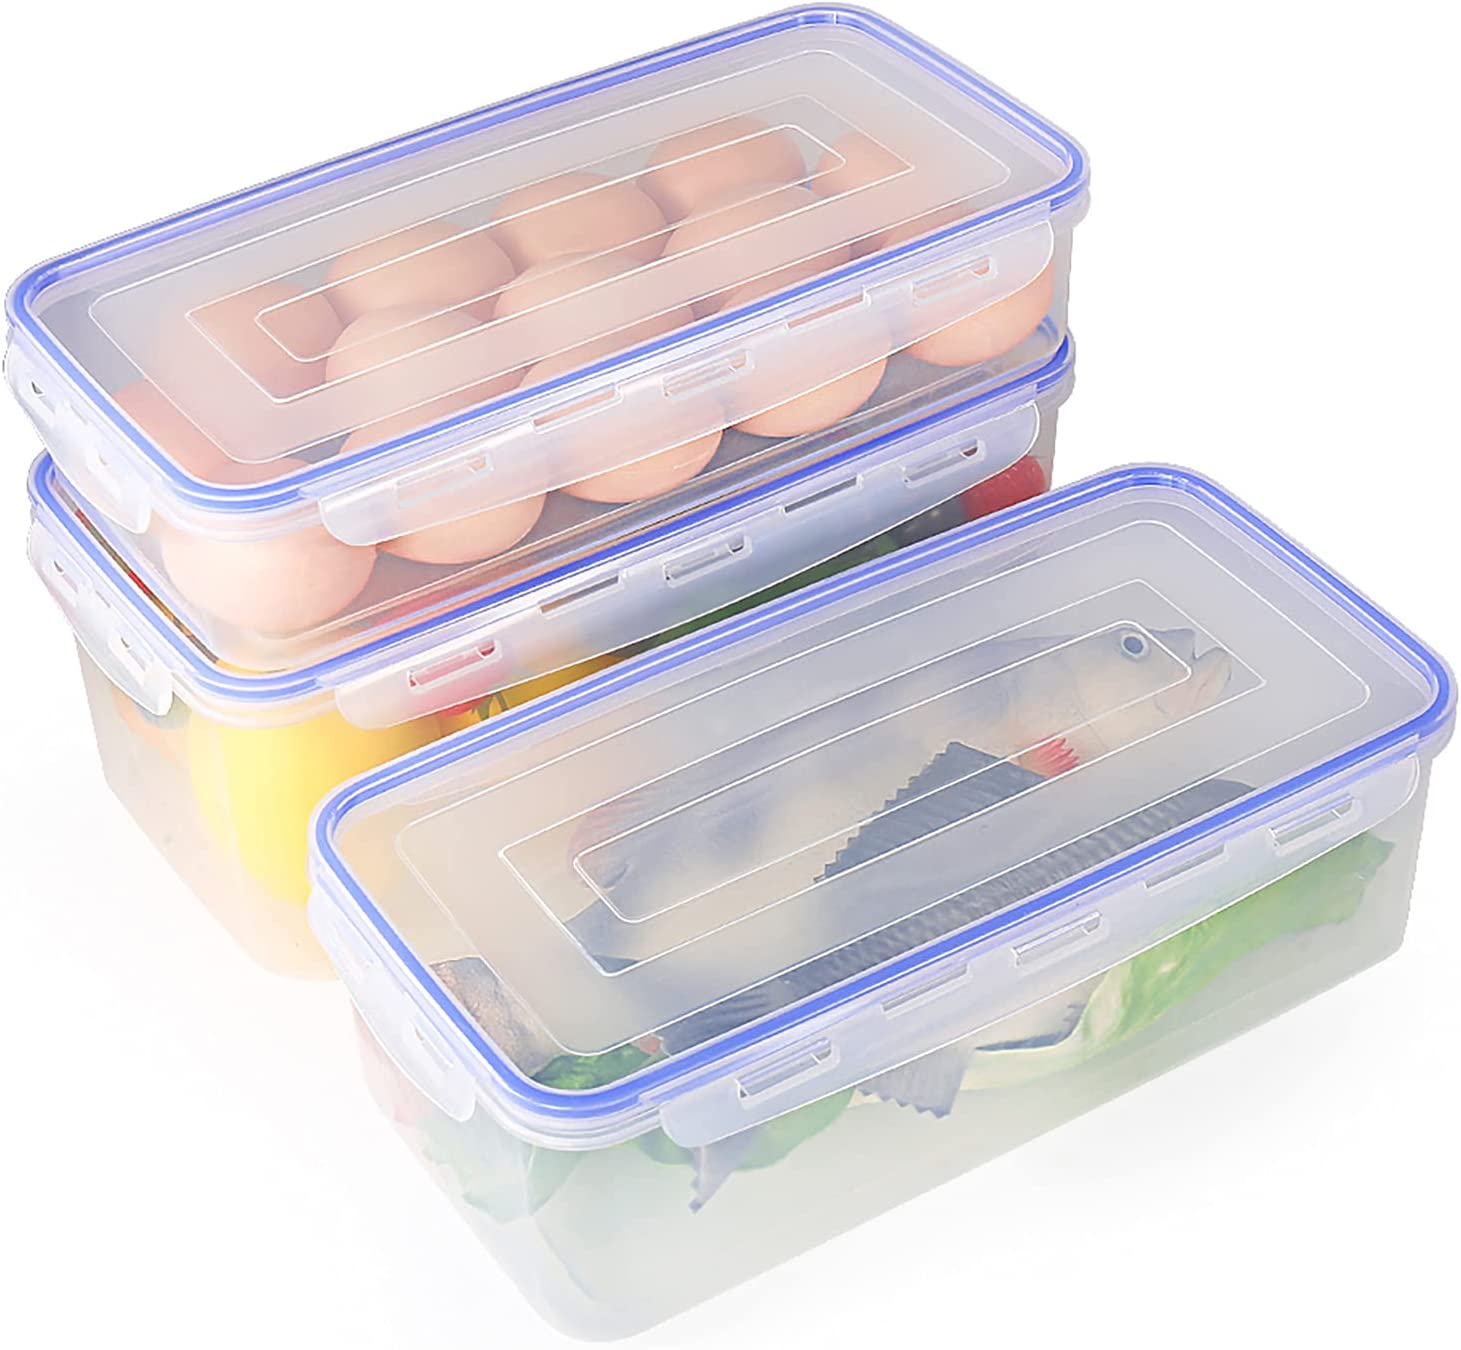 77L Food supreme Storage Sacramento Mall Plastic with Container